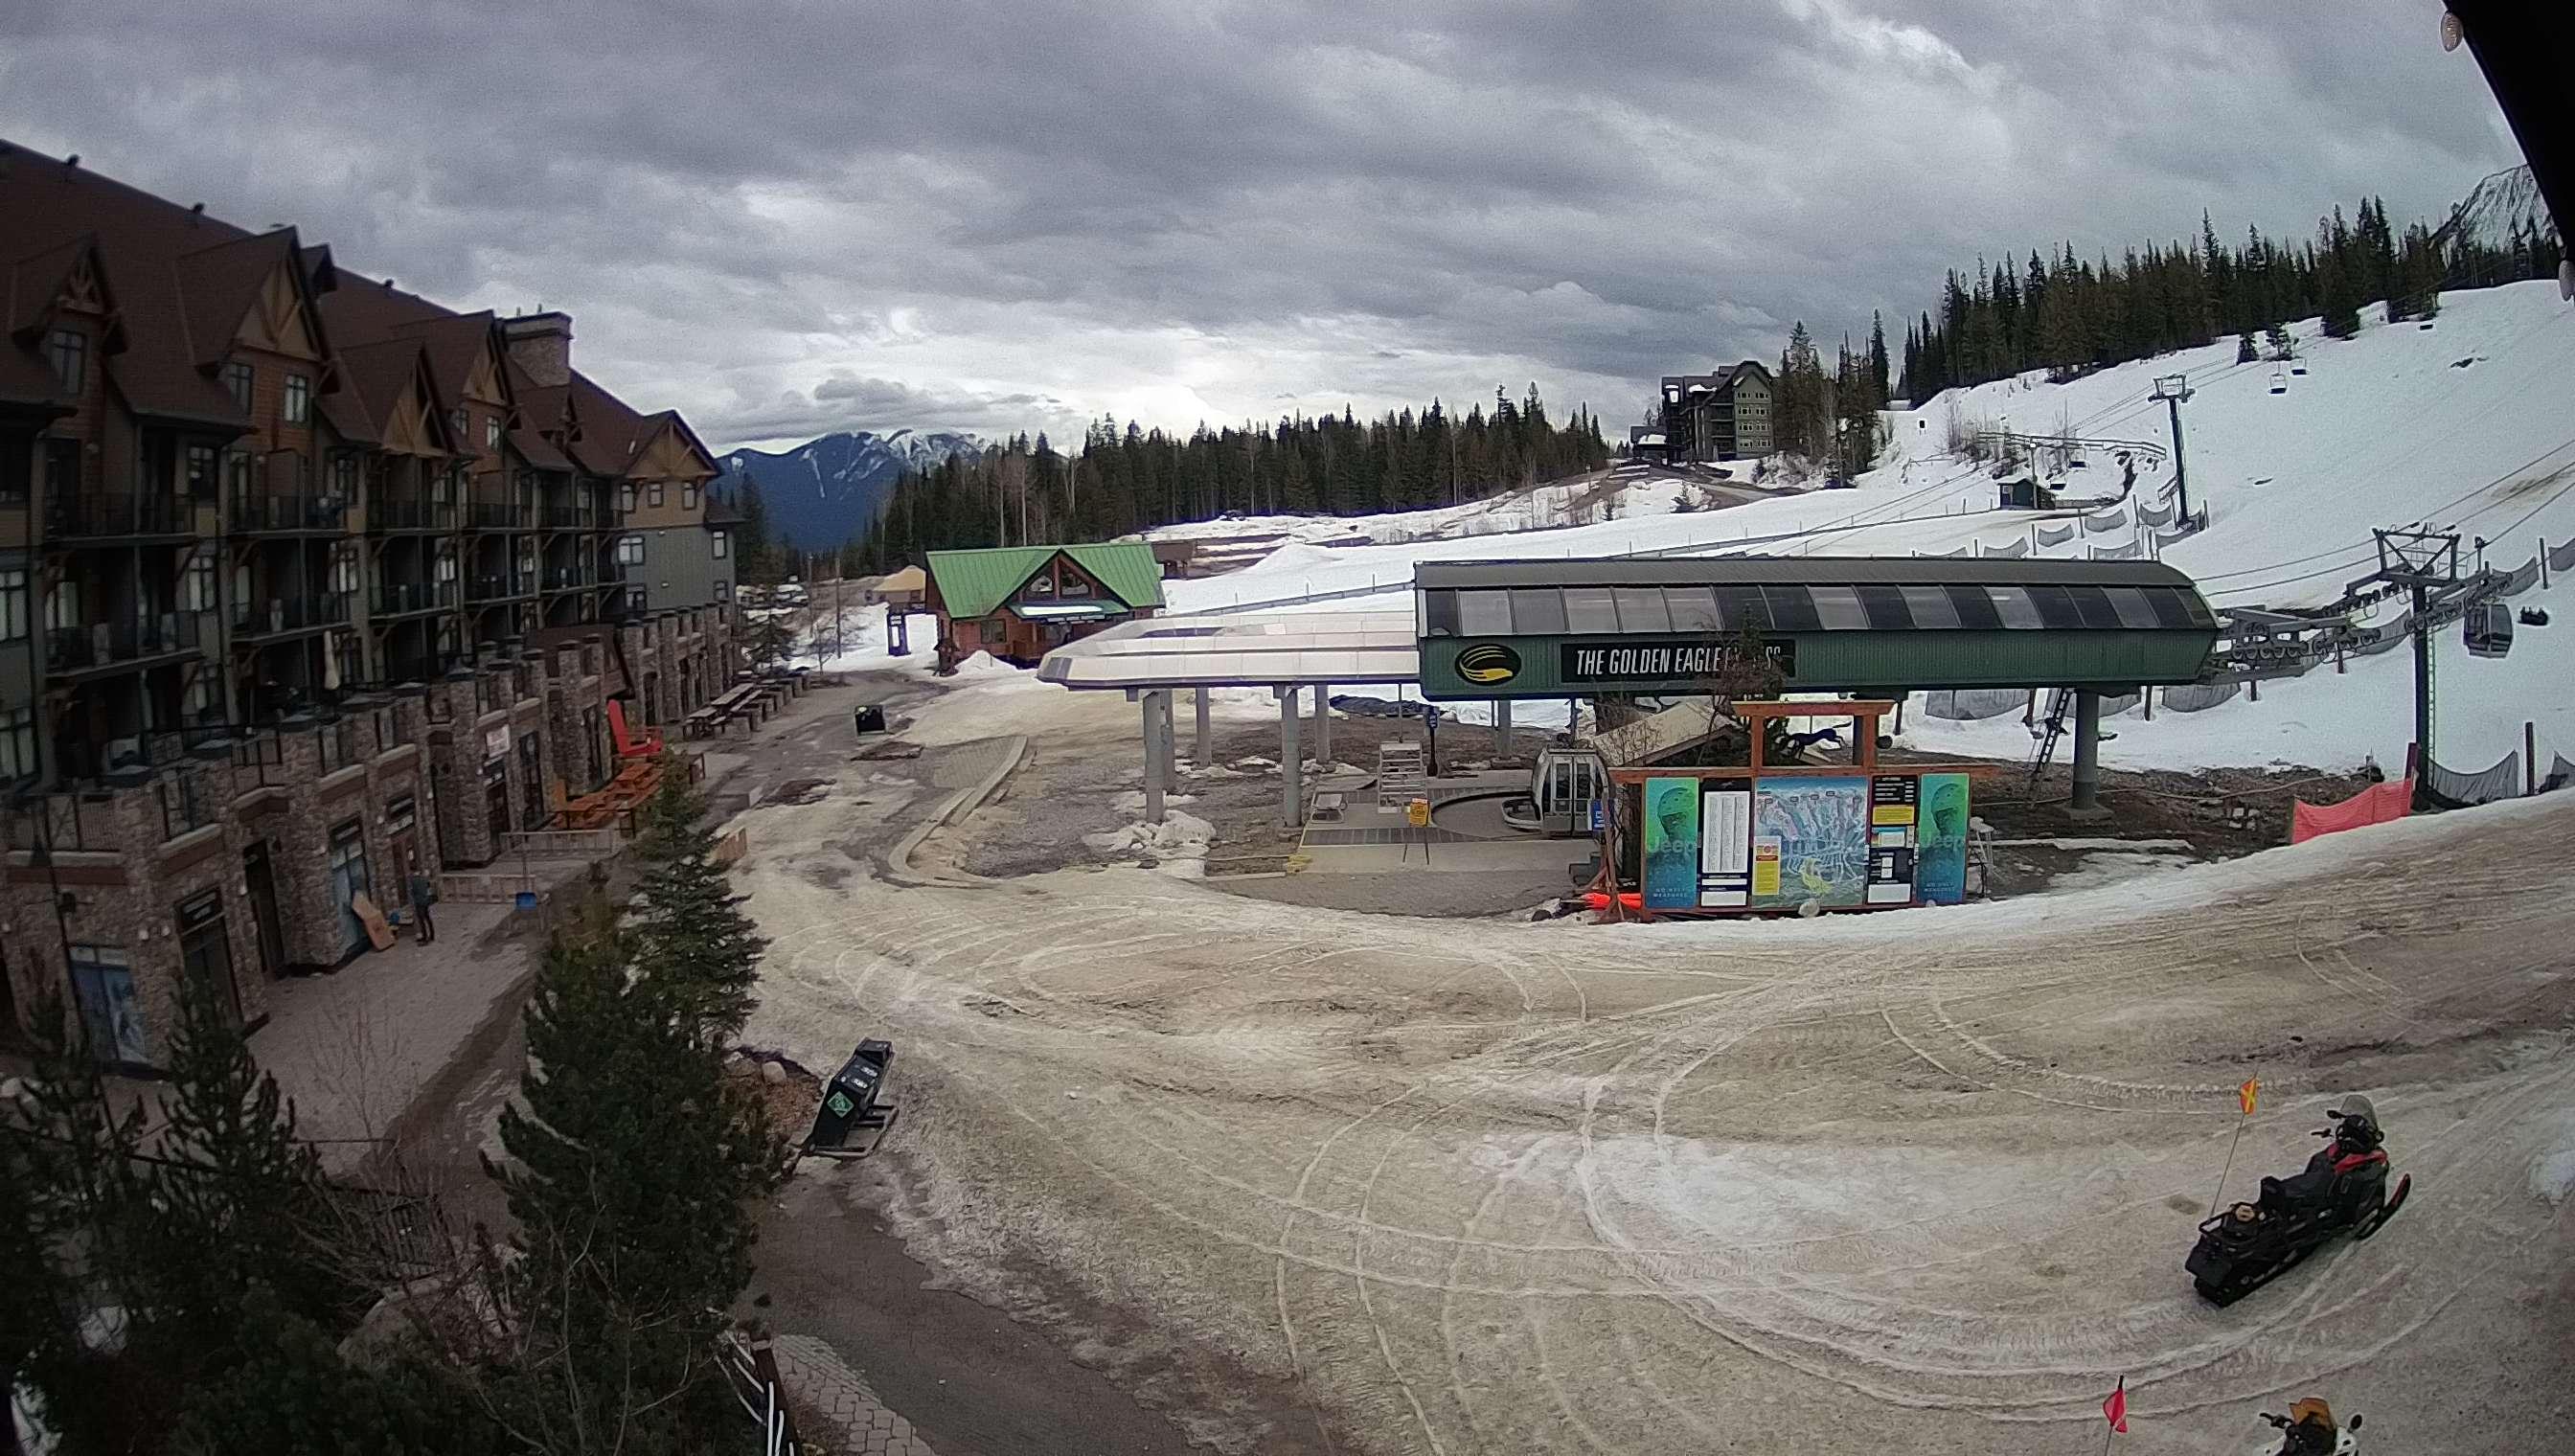 Kicking Horse Mountain Resort - Champagne Powder Capital of Canada™ 8713a92da53